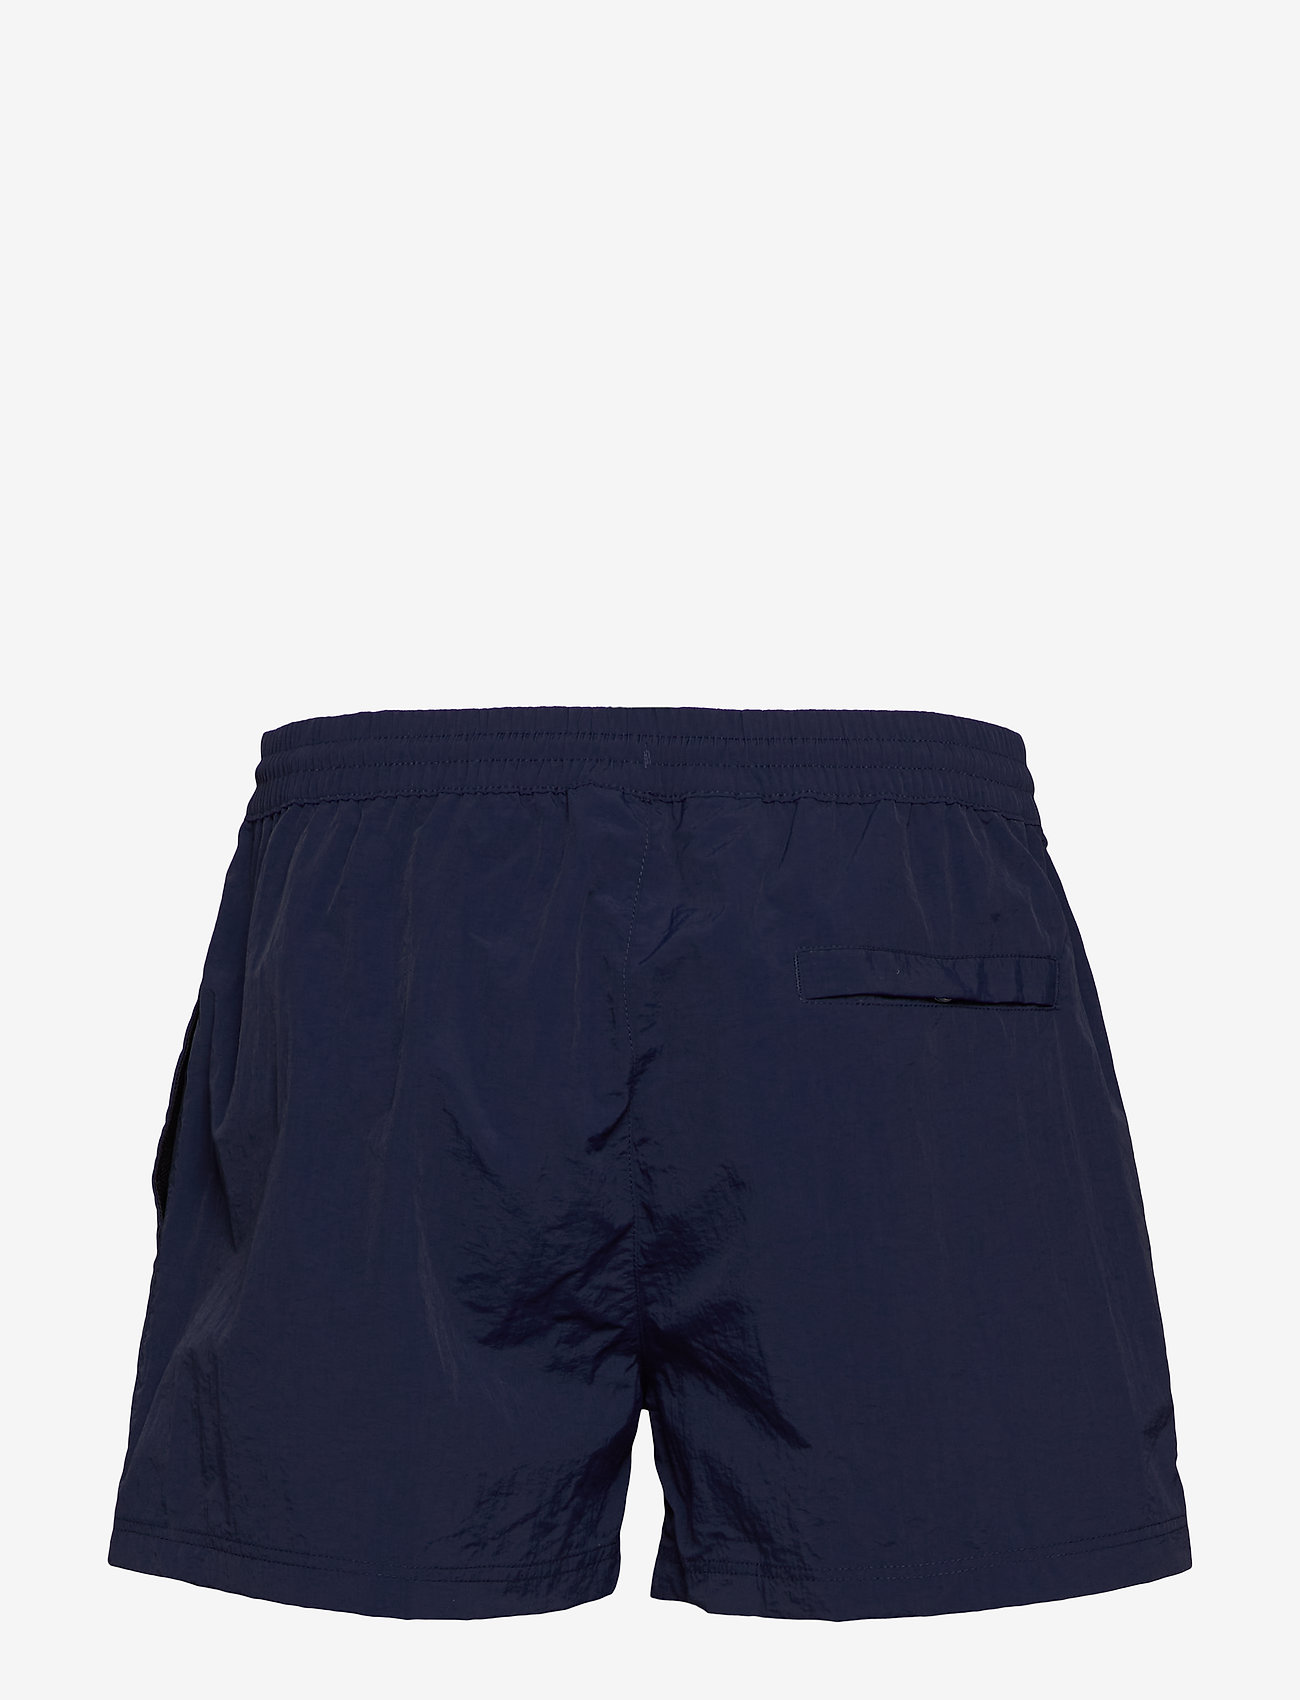 Men Manolo Woven Shorts (Black Iris) - FILA AA2JGJ